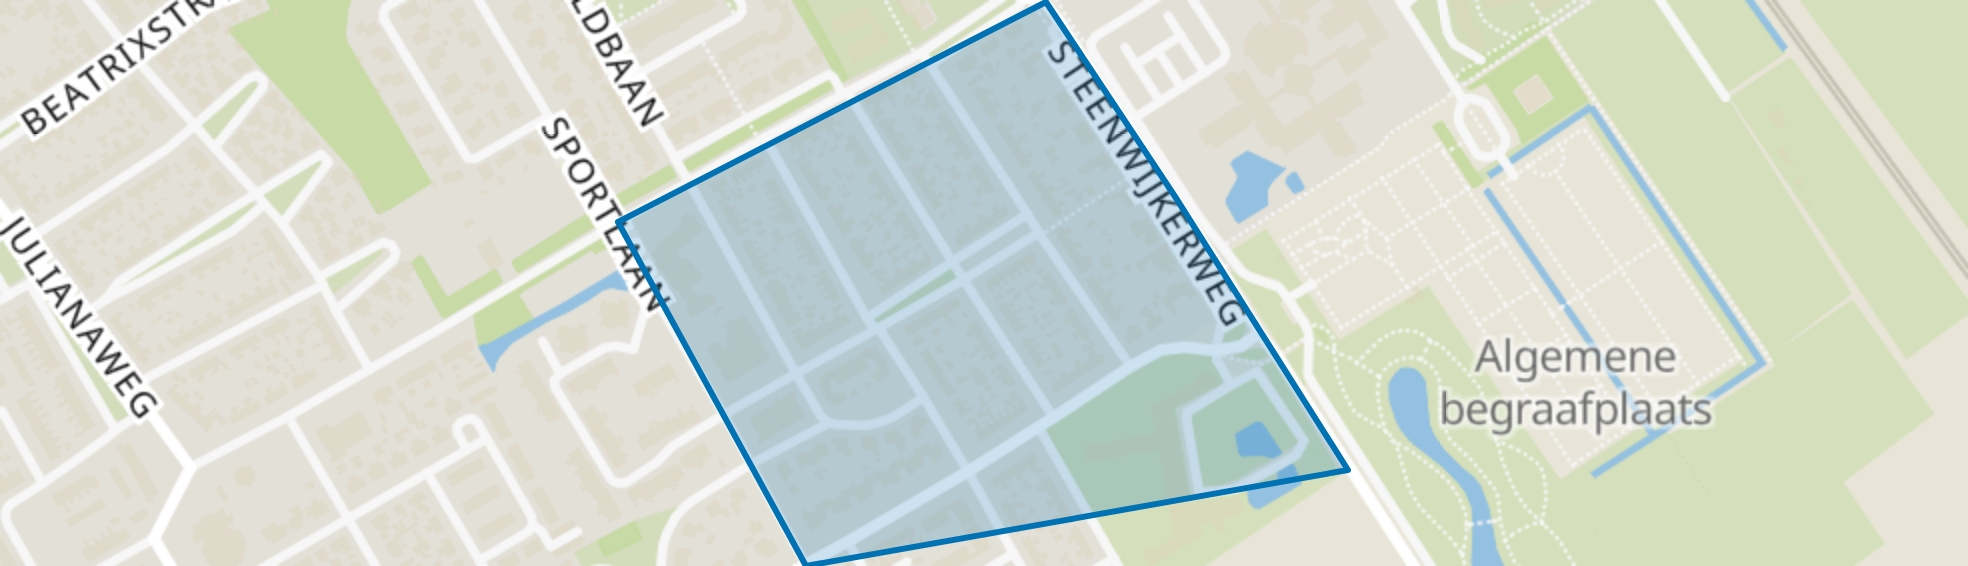 Wolvega-Staatsliedenbuurt, Wolvega map